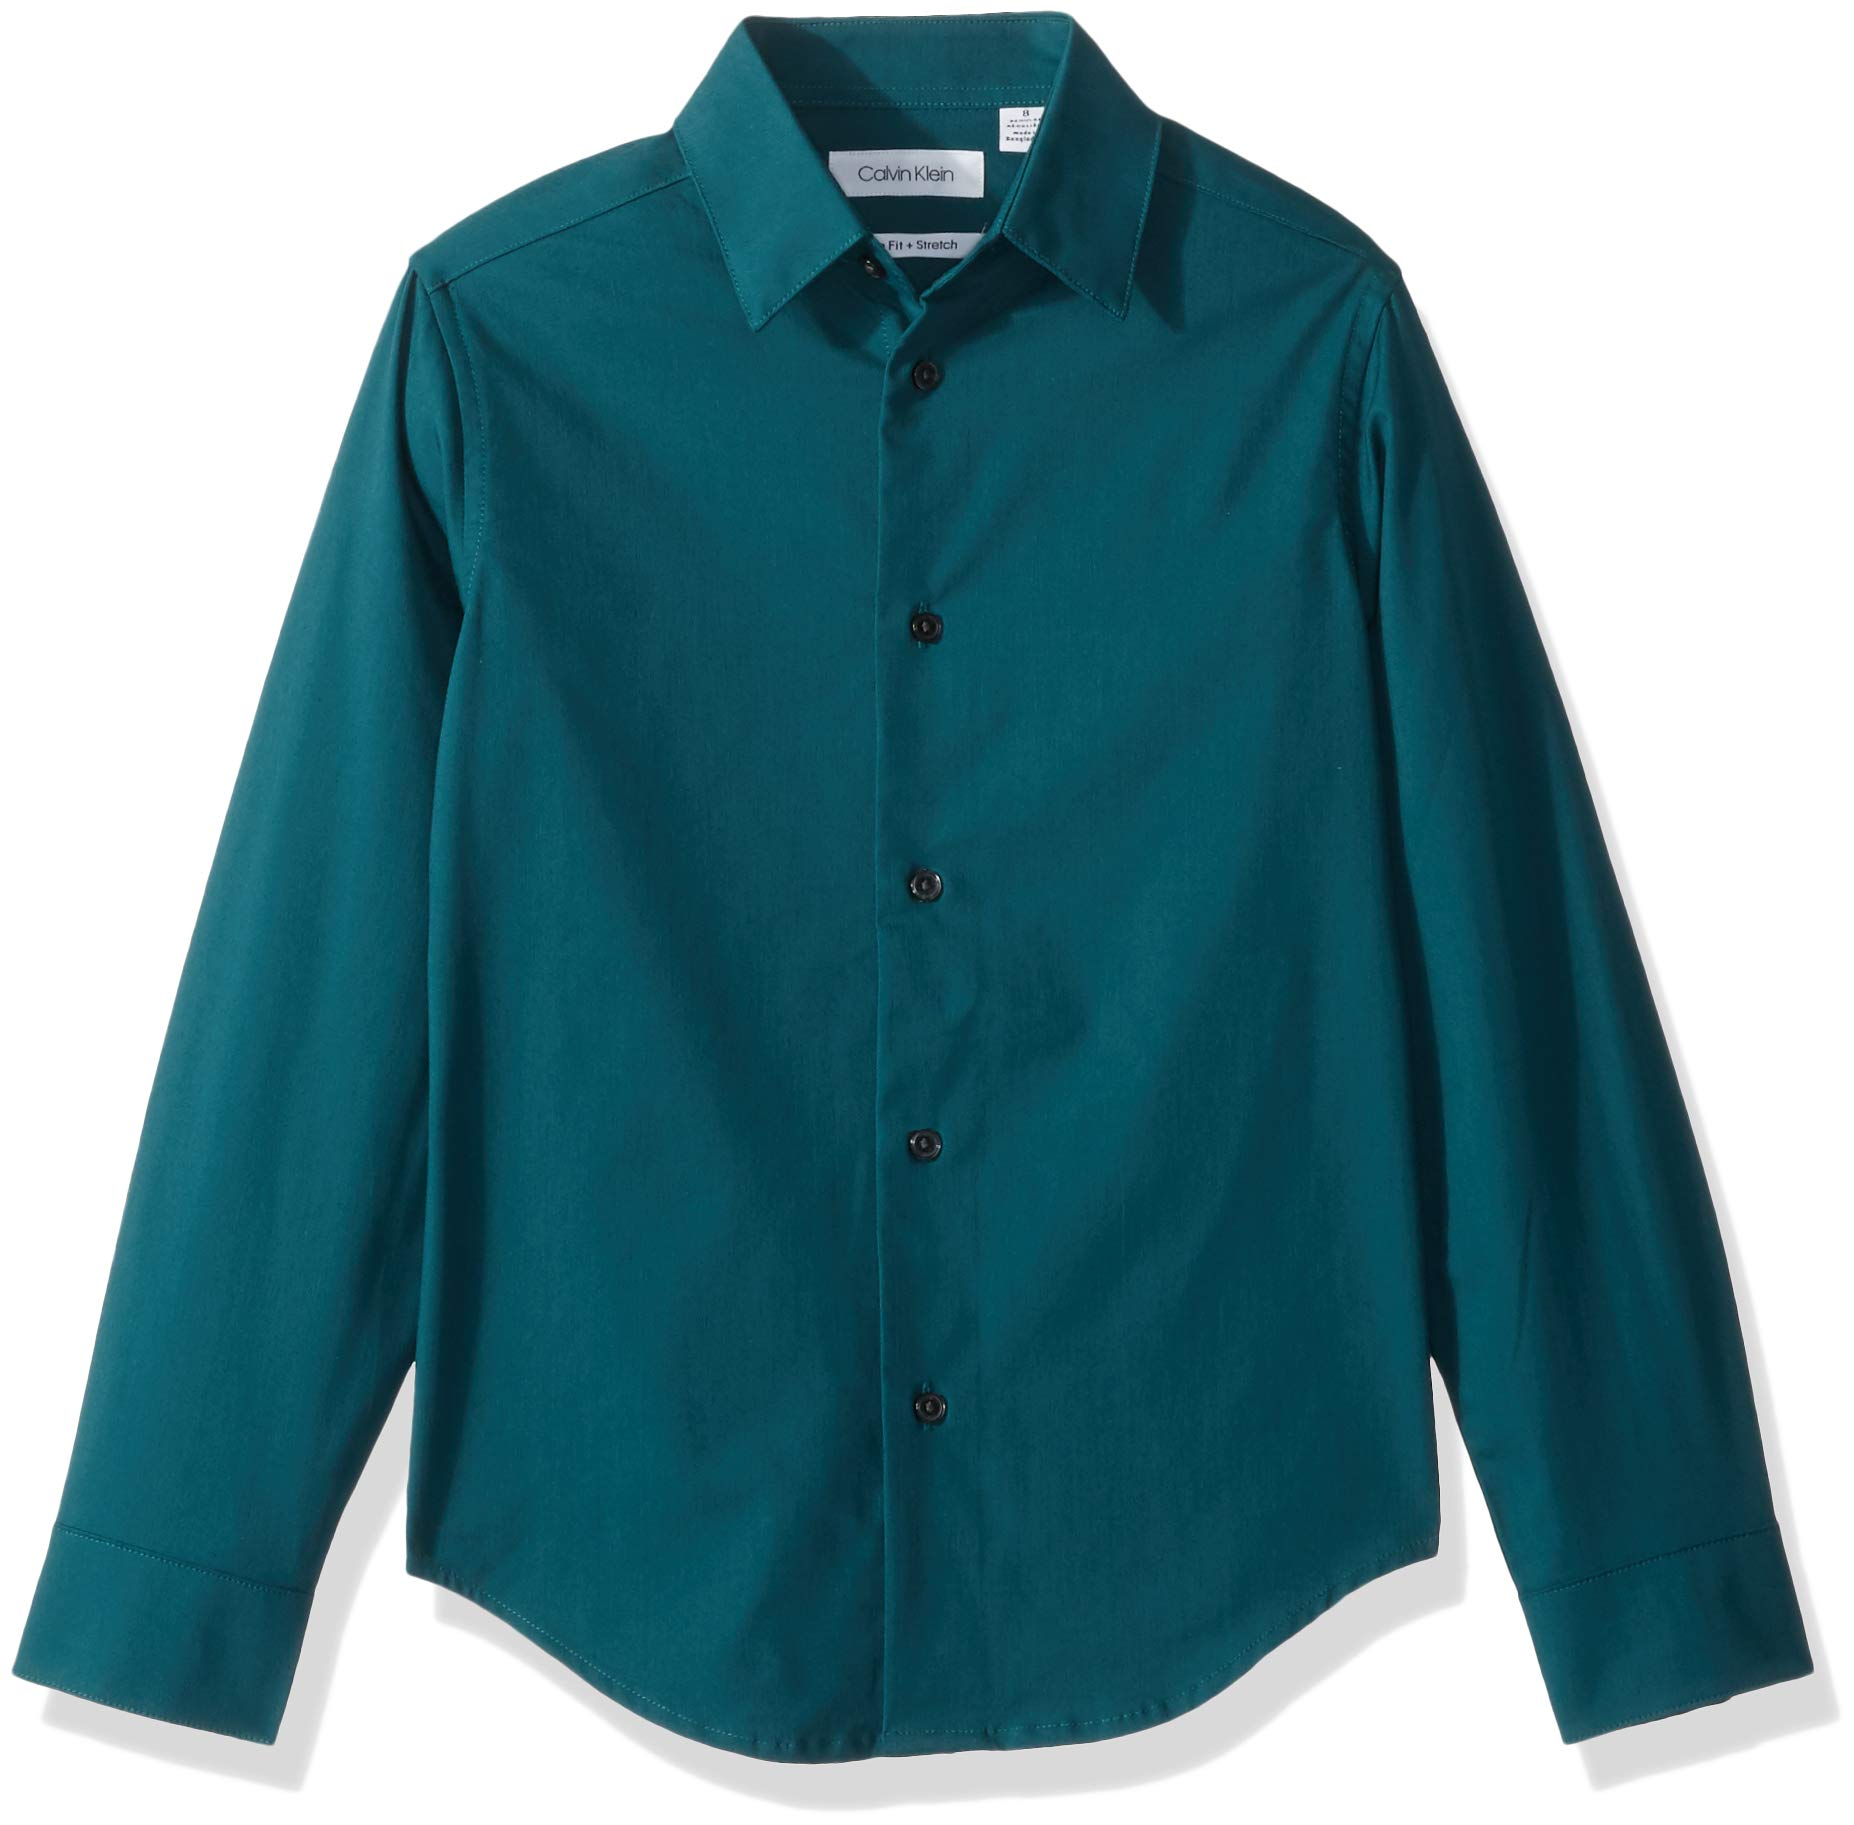 Calvin Klein Big Boys' Long Sleeve Solid Button-Down Dress Shirt, Green Jewel, 16 by Calvin Klein (Image #2)